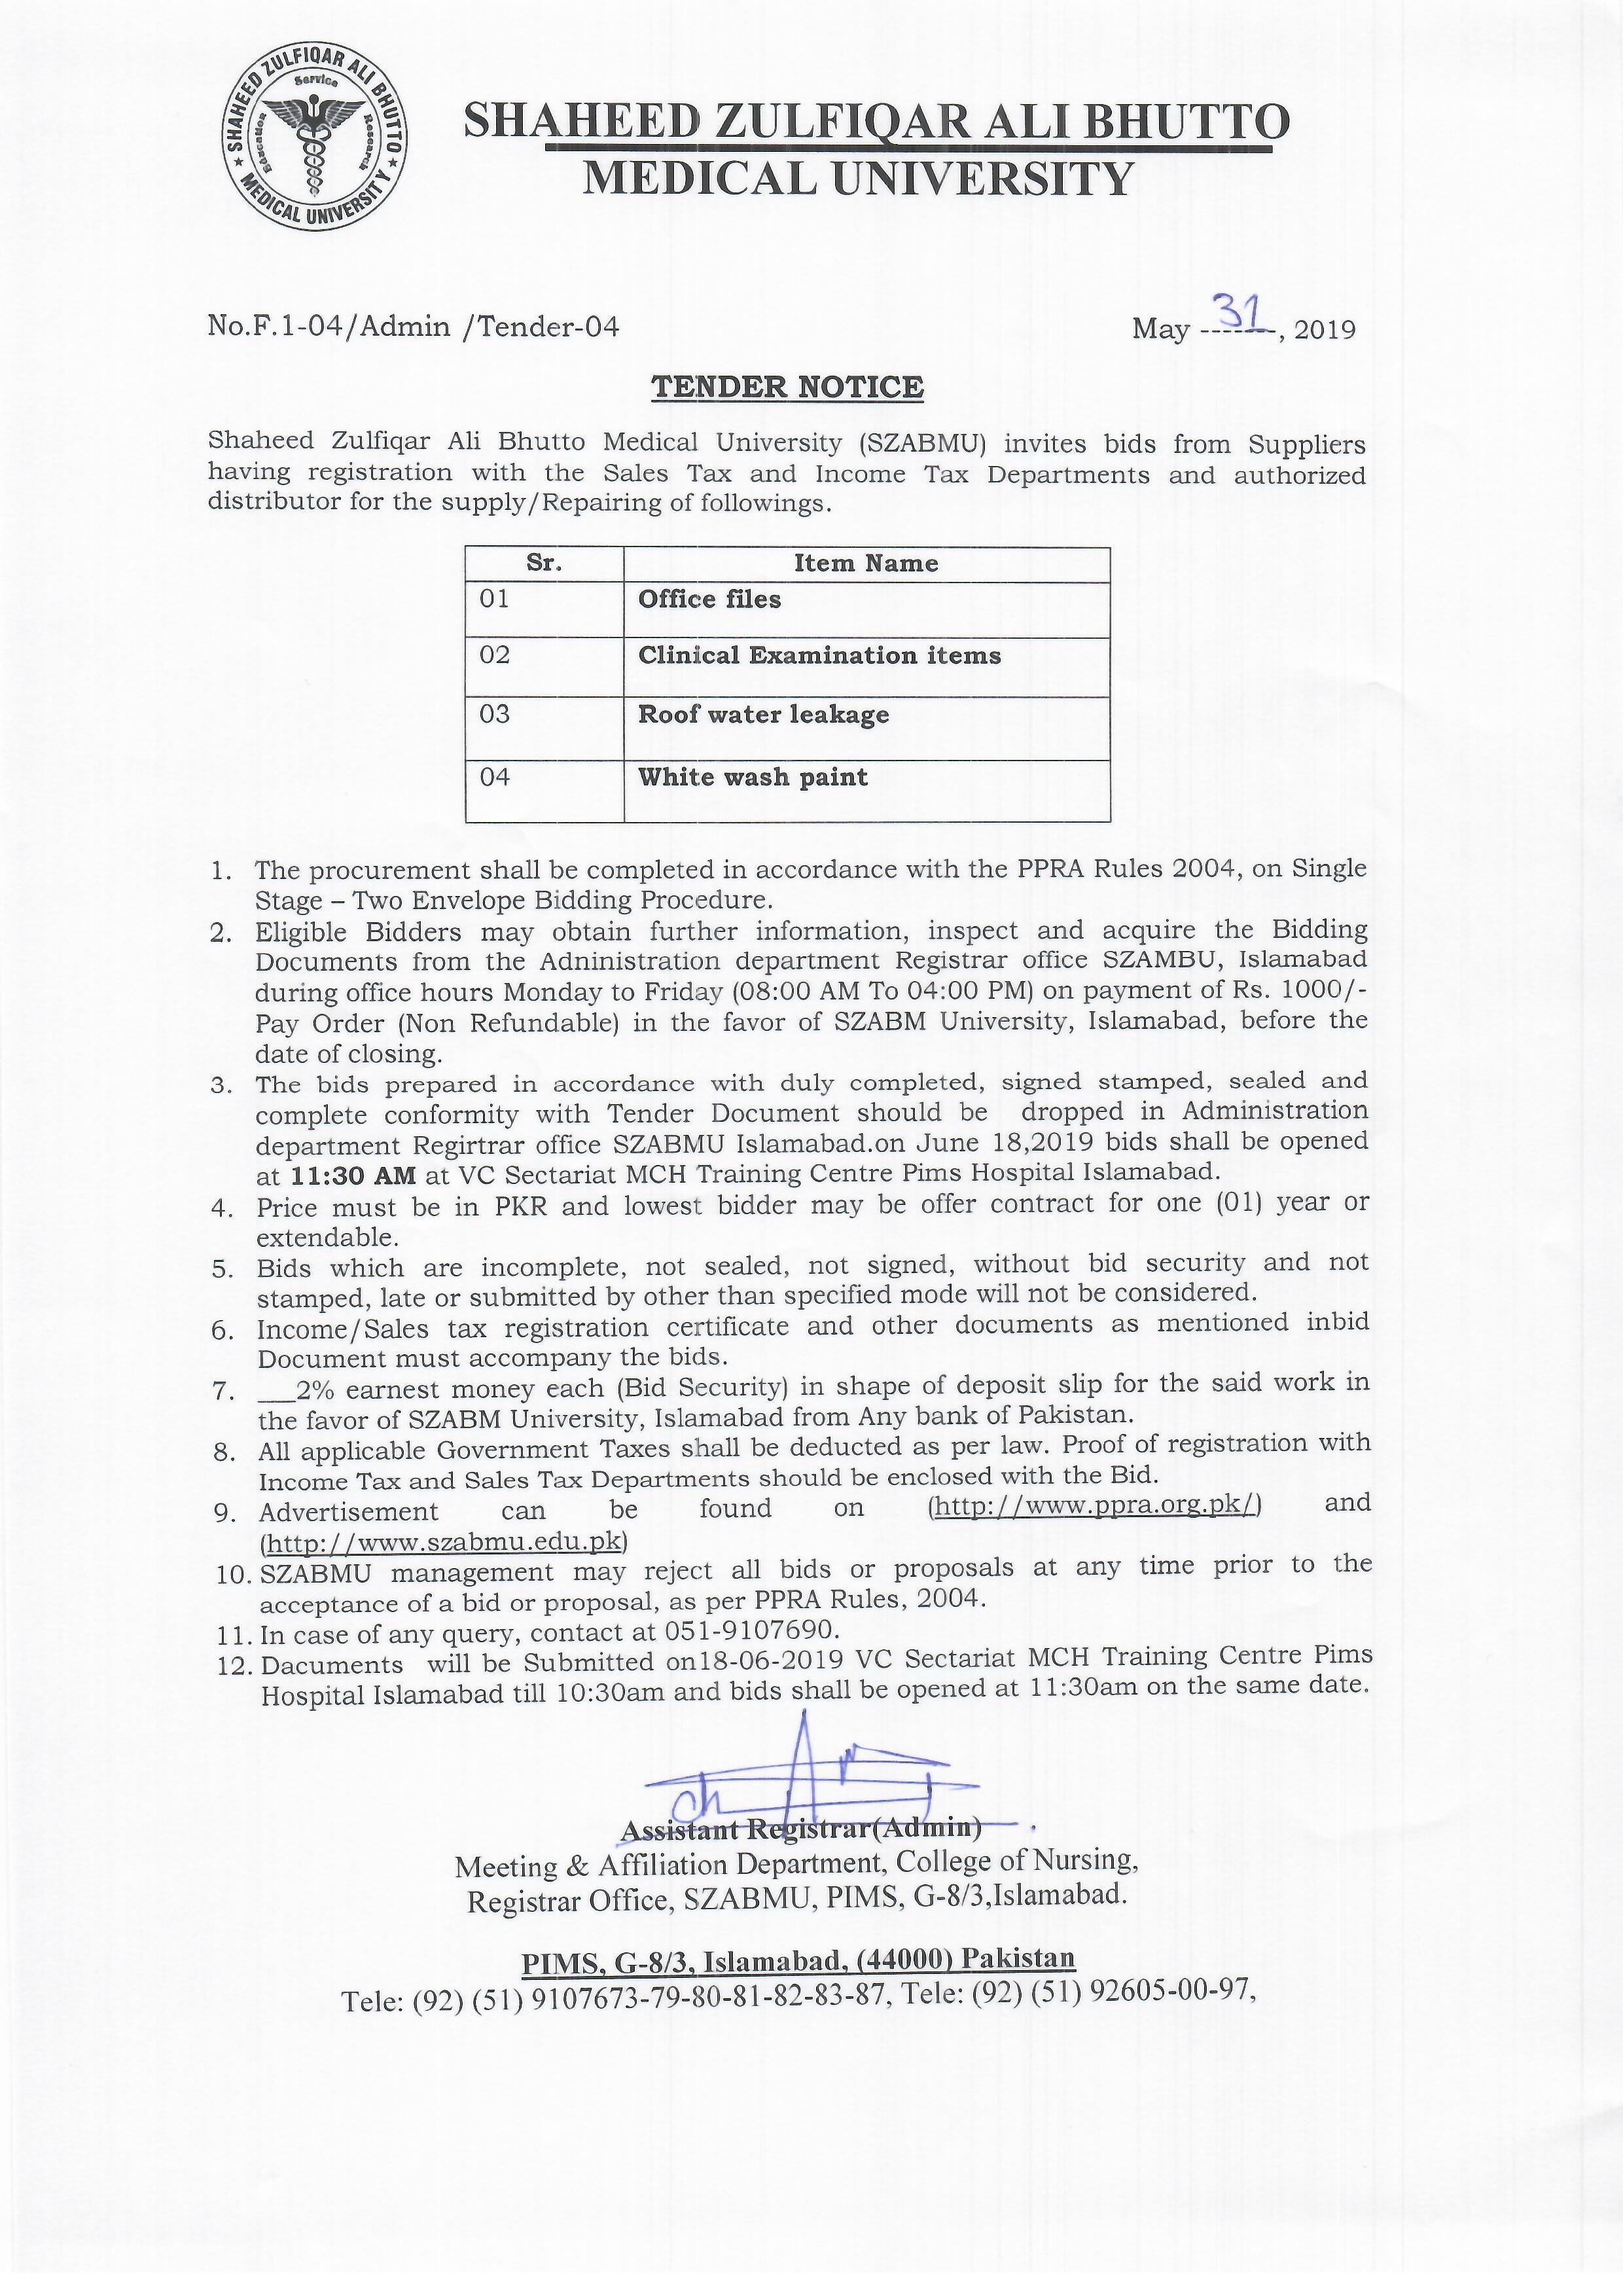 Tender Notice 31 May 2019